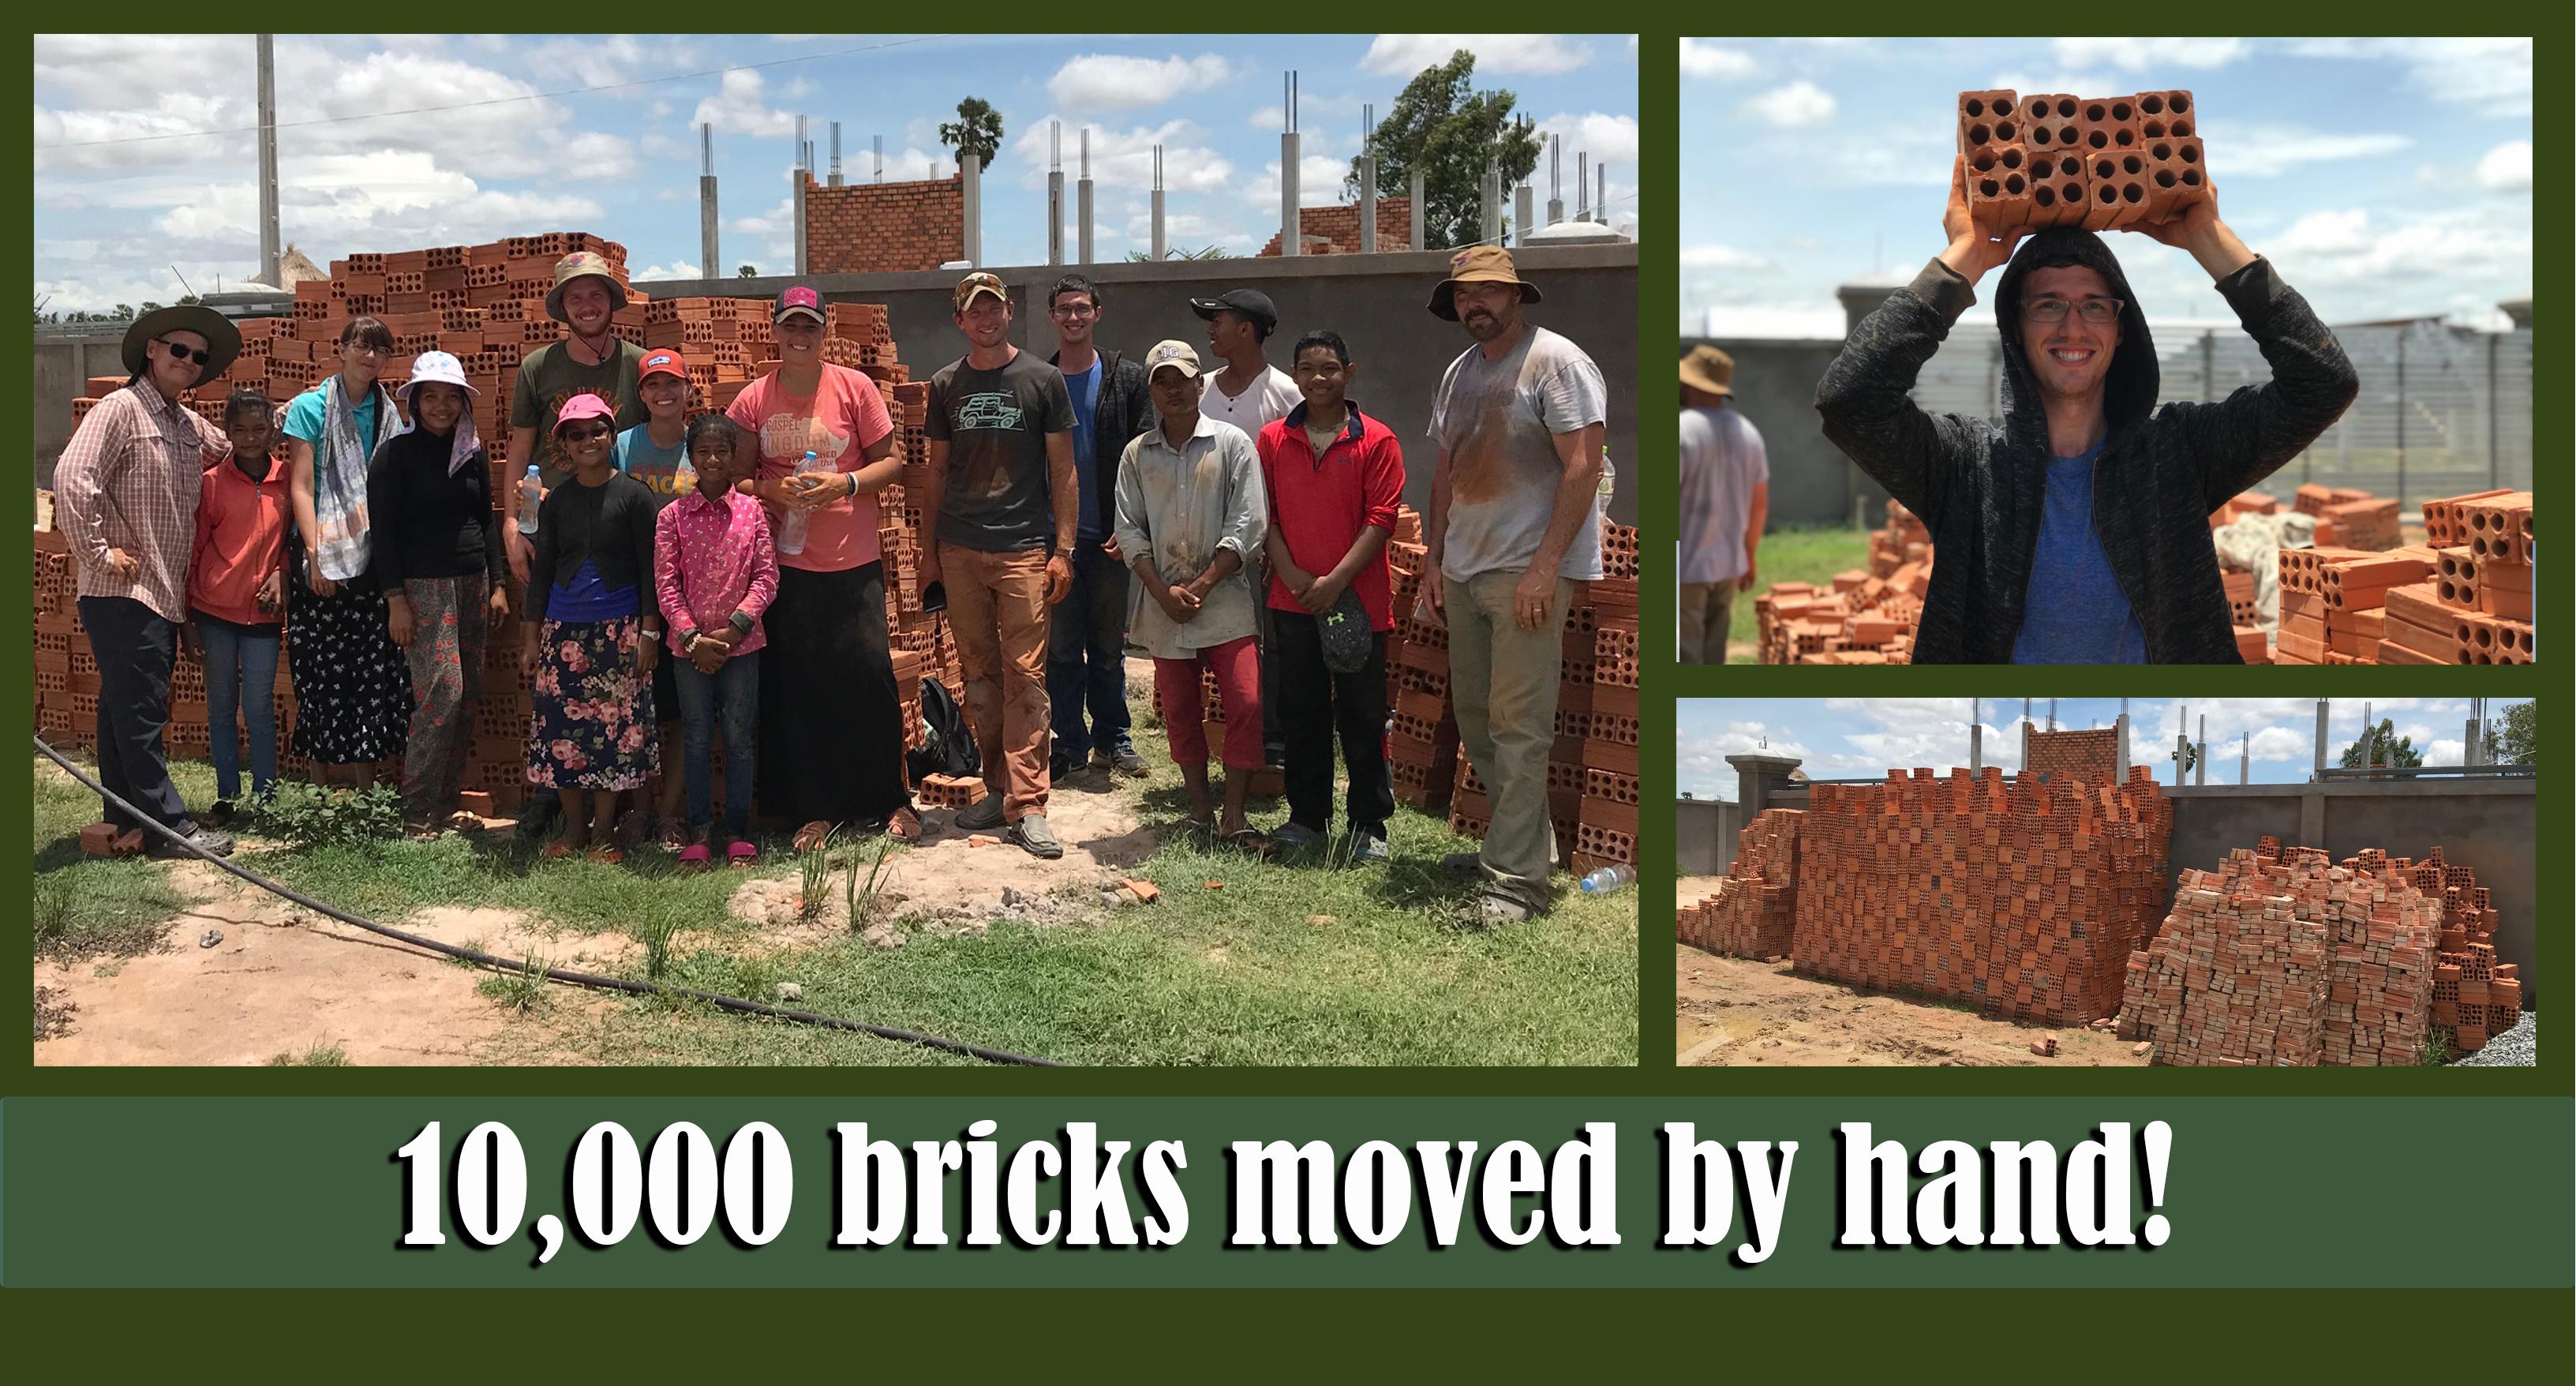 7.23.19 Bricks moved